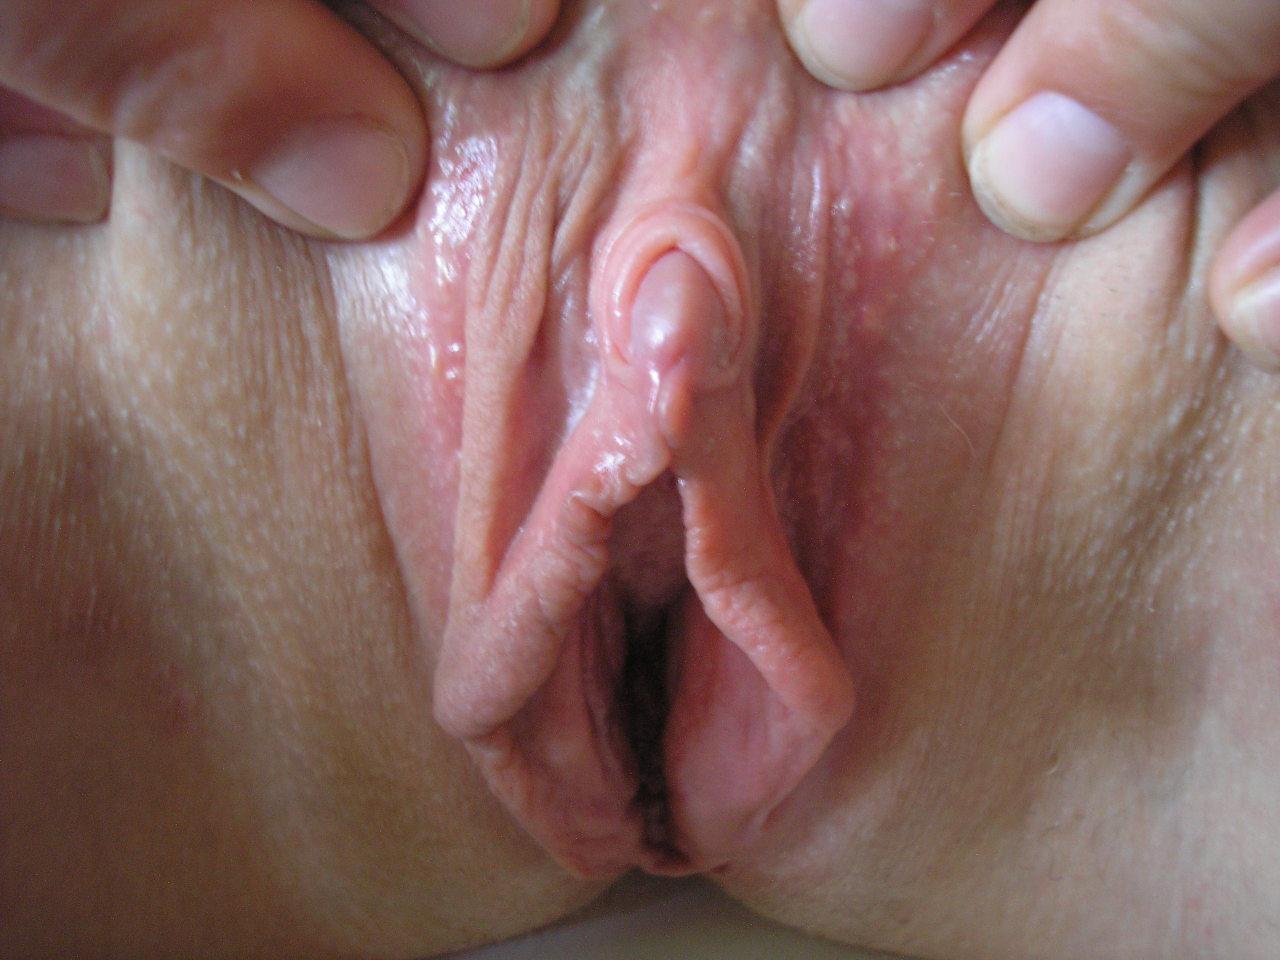 tumblr clit rub orgasm datawav